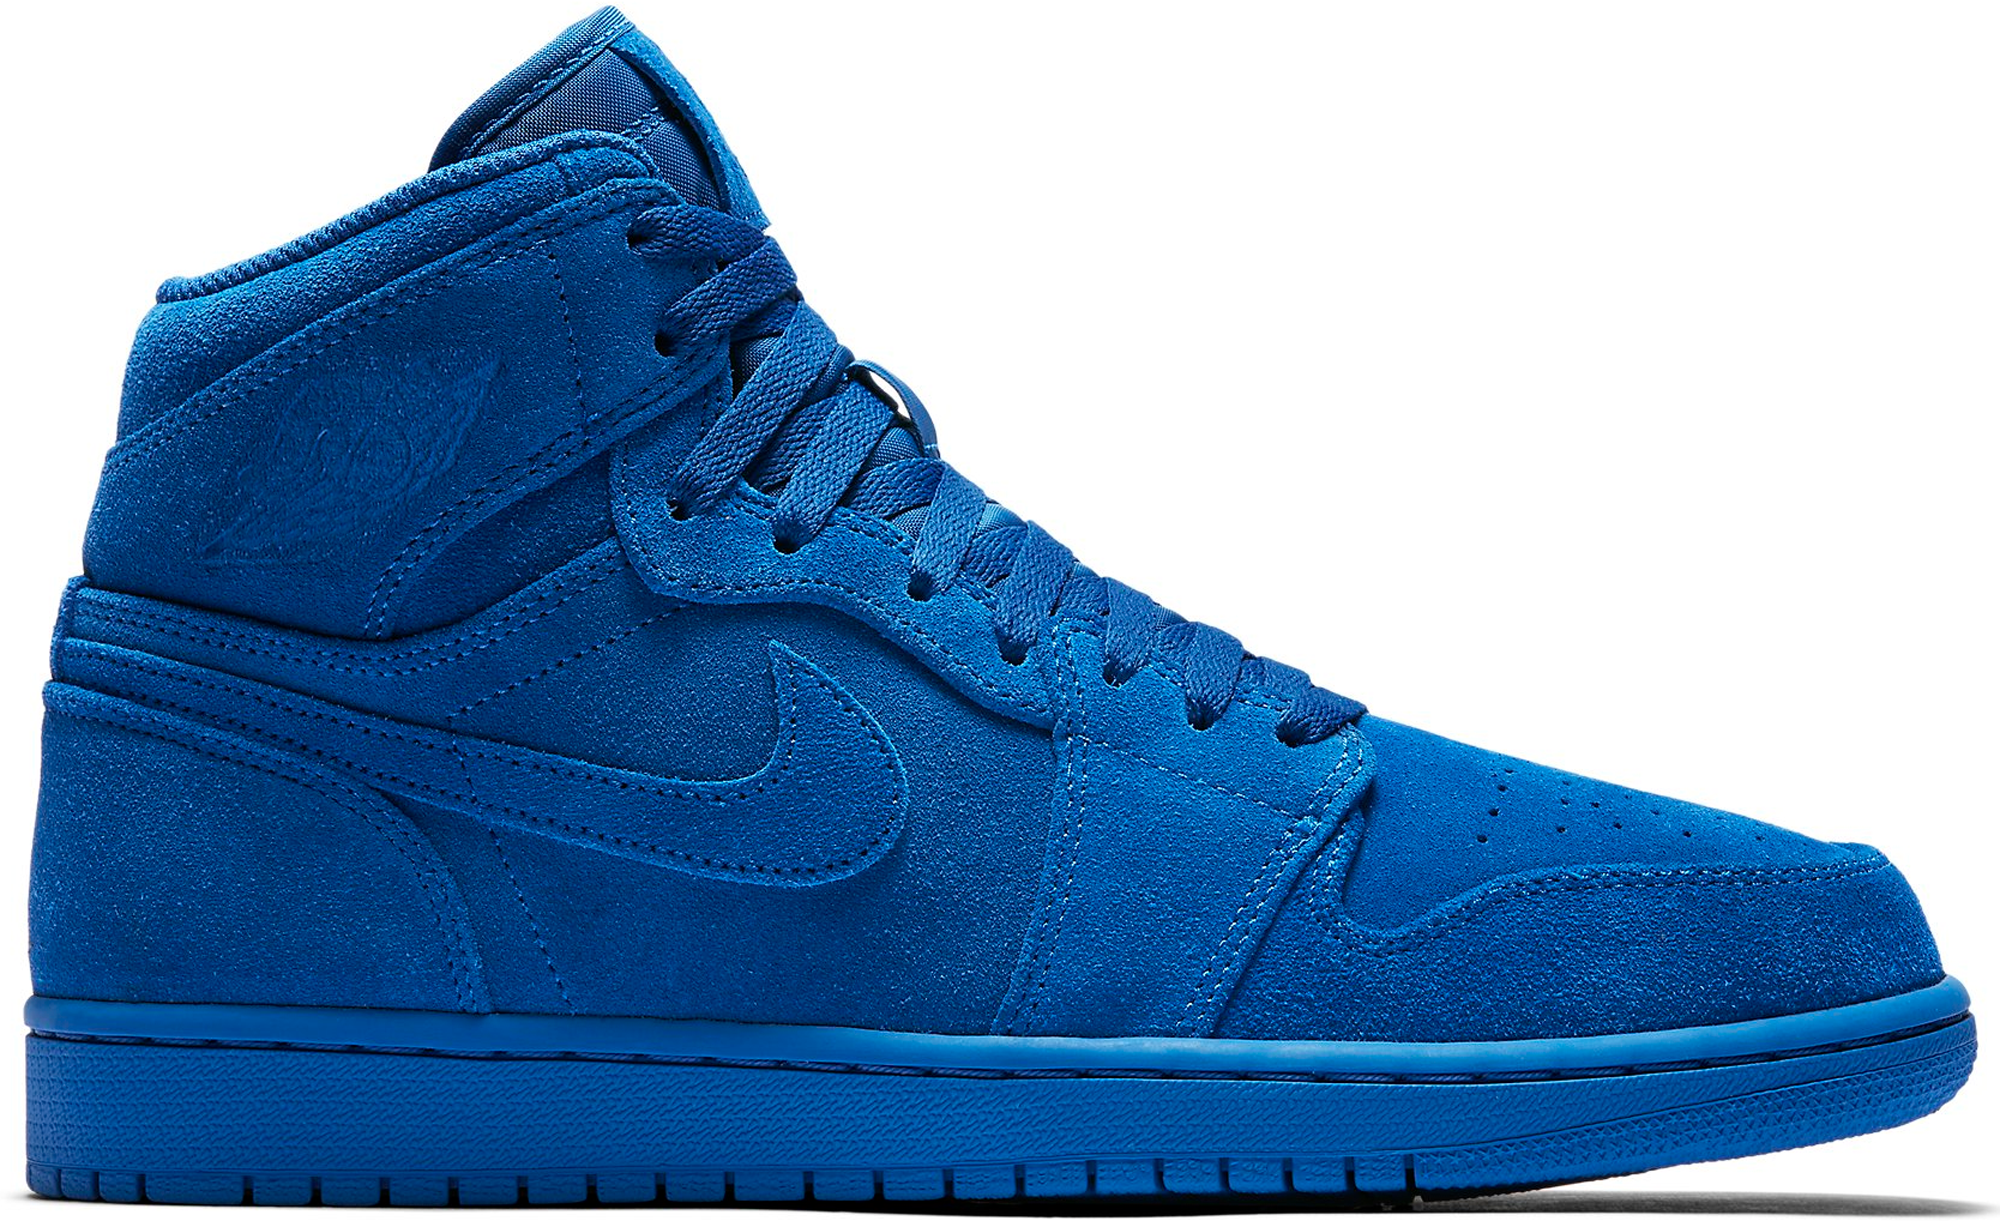 Jordan 1 Retro Blue Suede